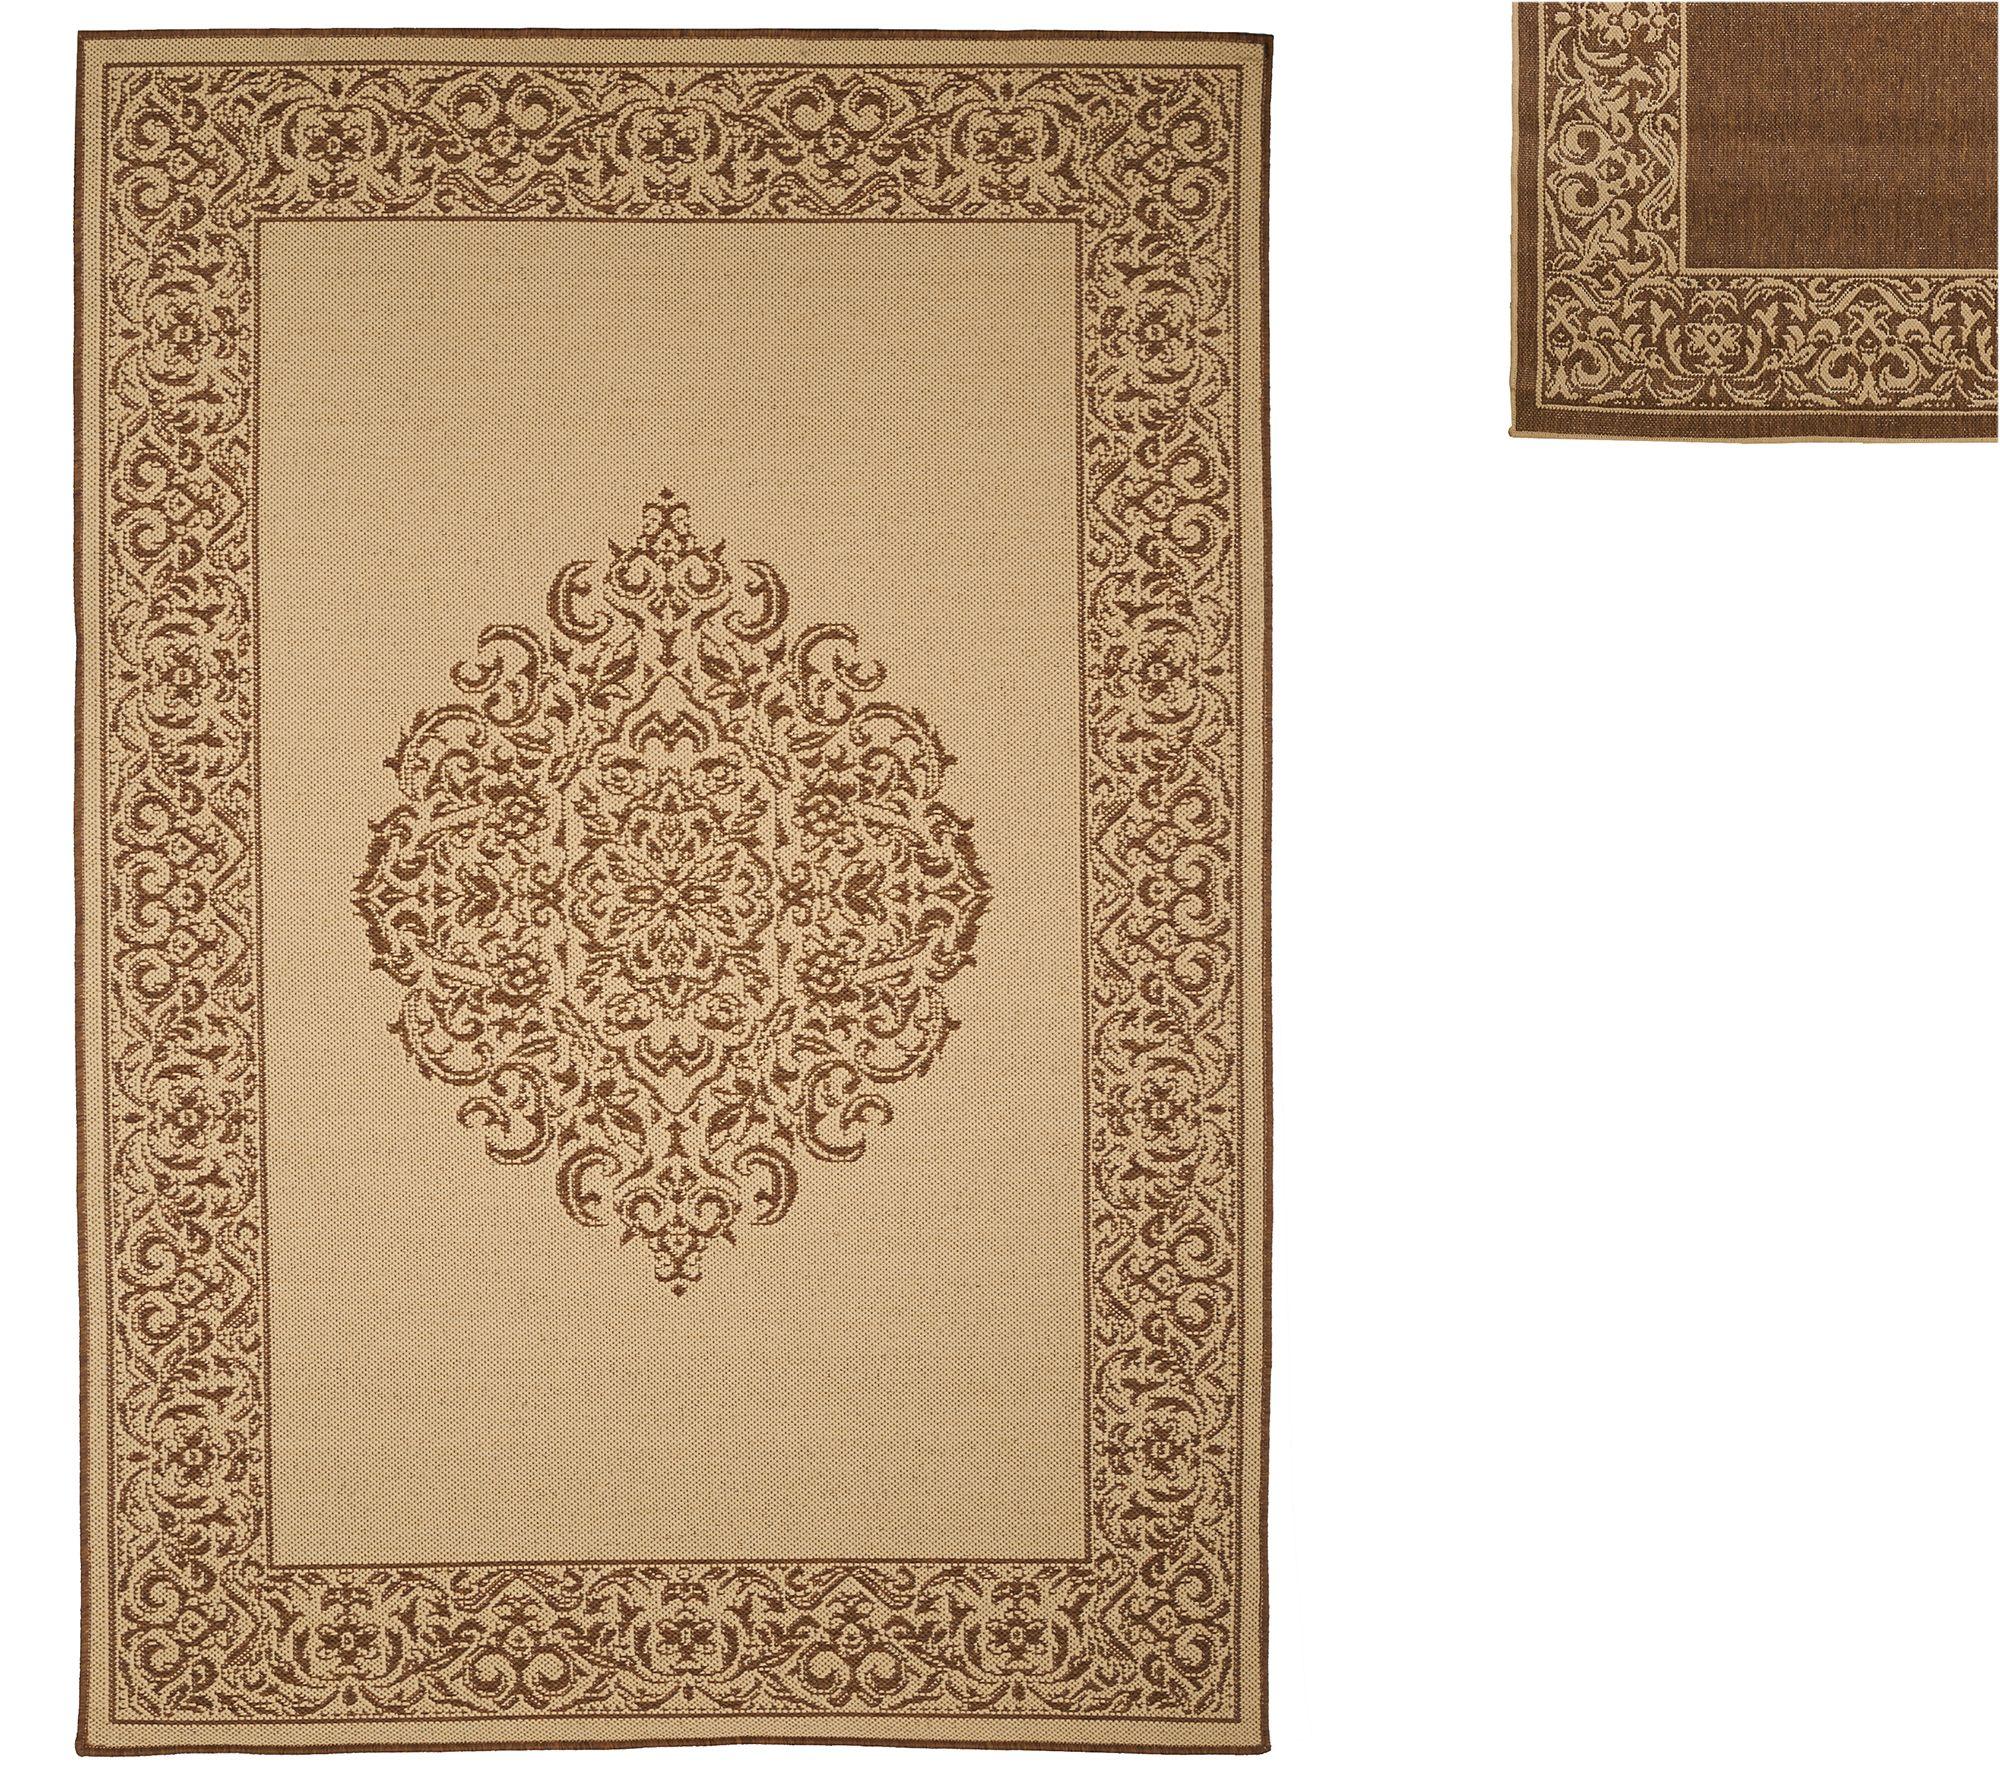 veranda living naturals indoor outdoor 5x7 medallion reversible rug page 1. Black Bedroom Furniture Sets. Home Design Ideas